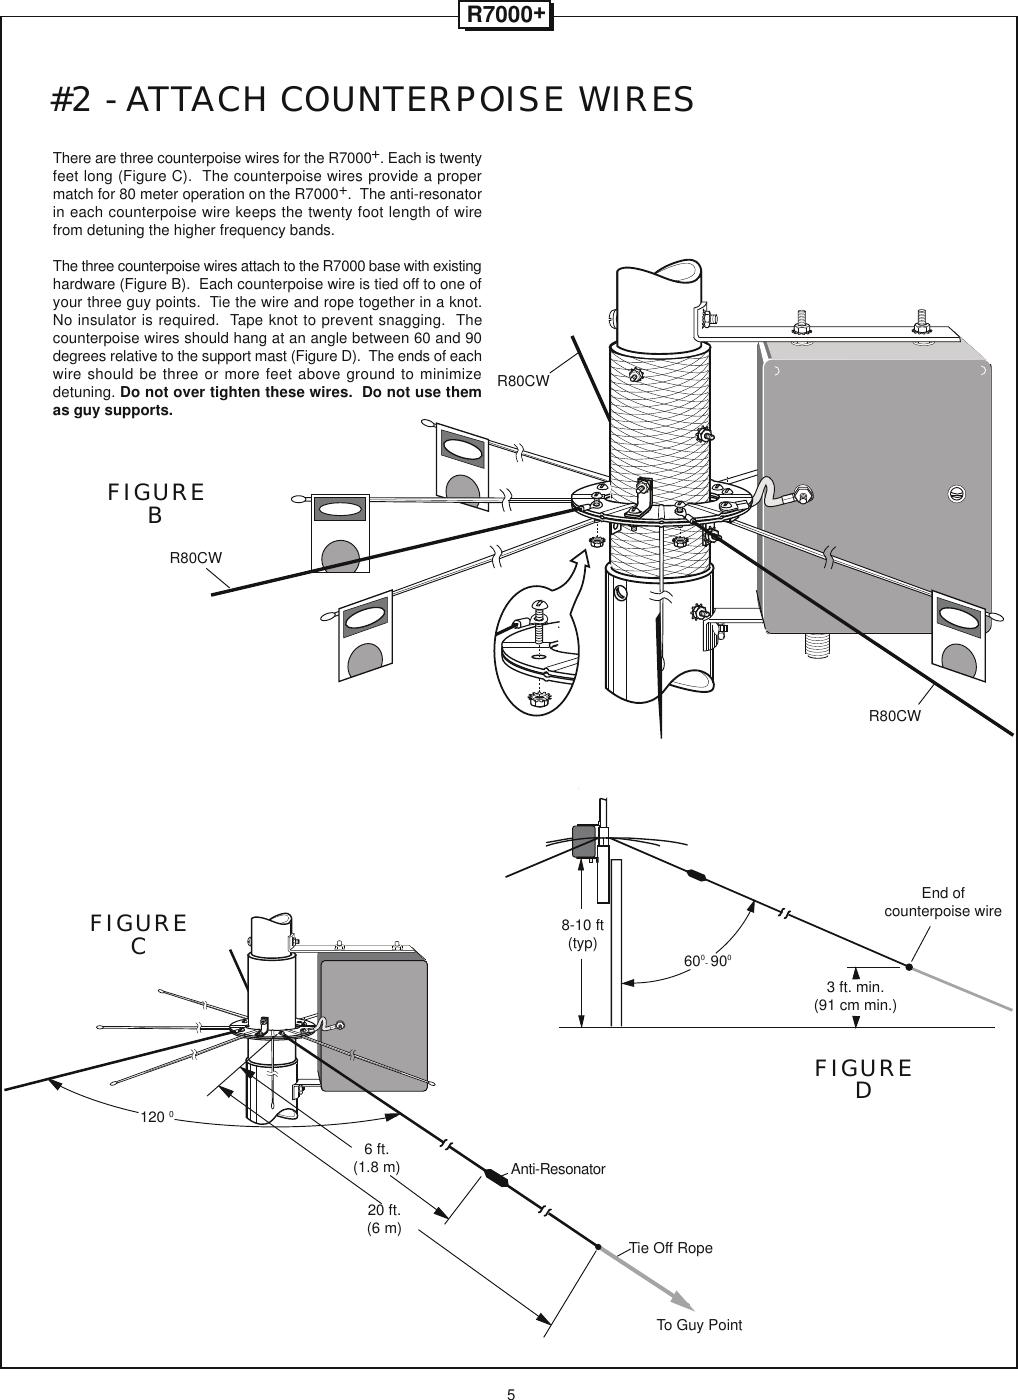 Page 6 of 8 - CUSHCRAFT--R-7000+INSTALLATION CUSHCRAFT--R-7000 INSTALLATION